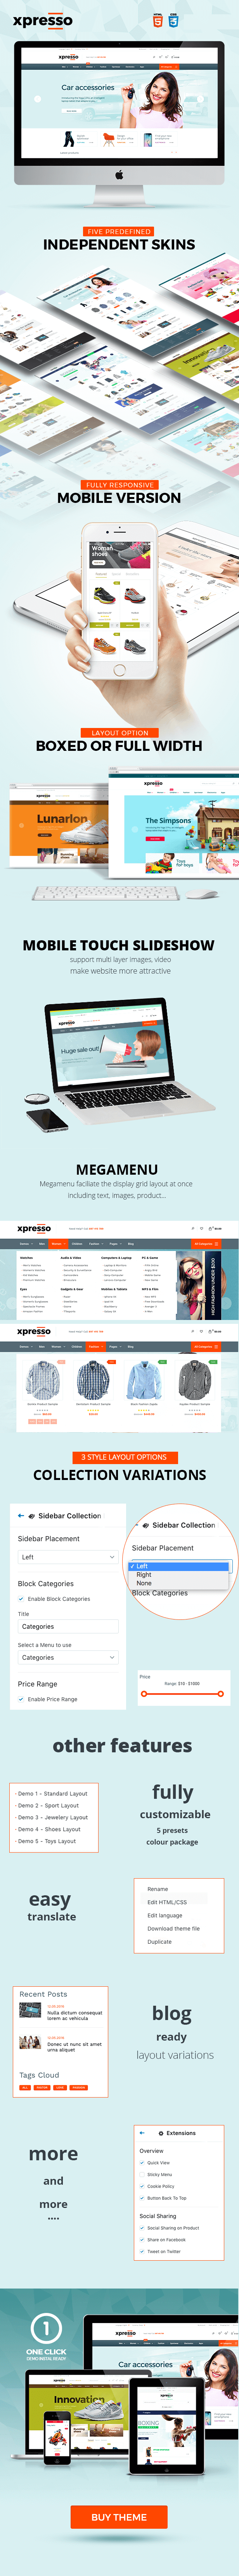 xpresso multipurpose responsive shopify theme